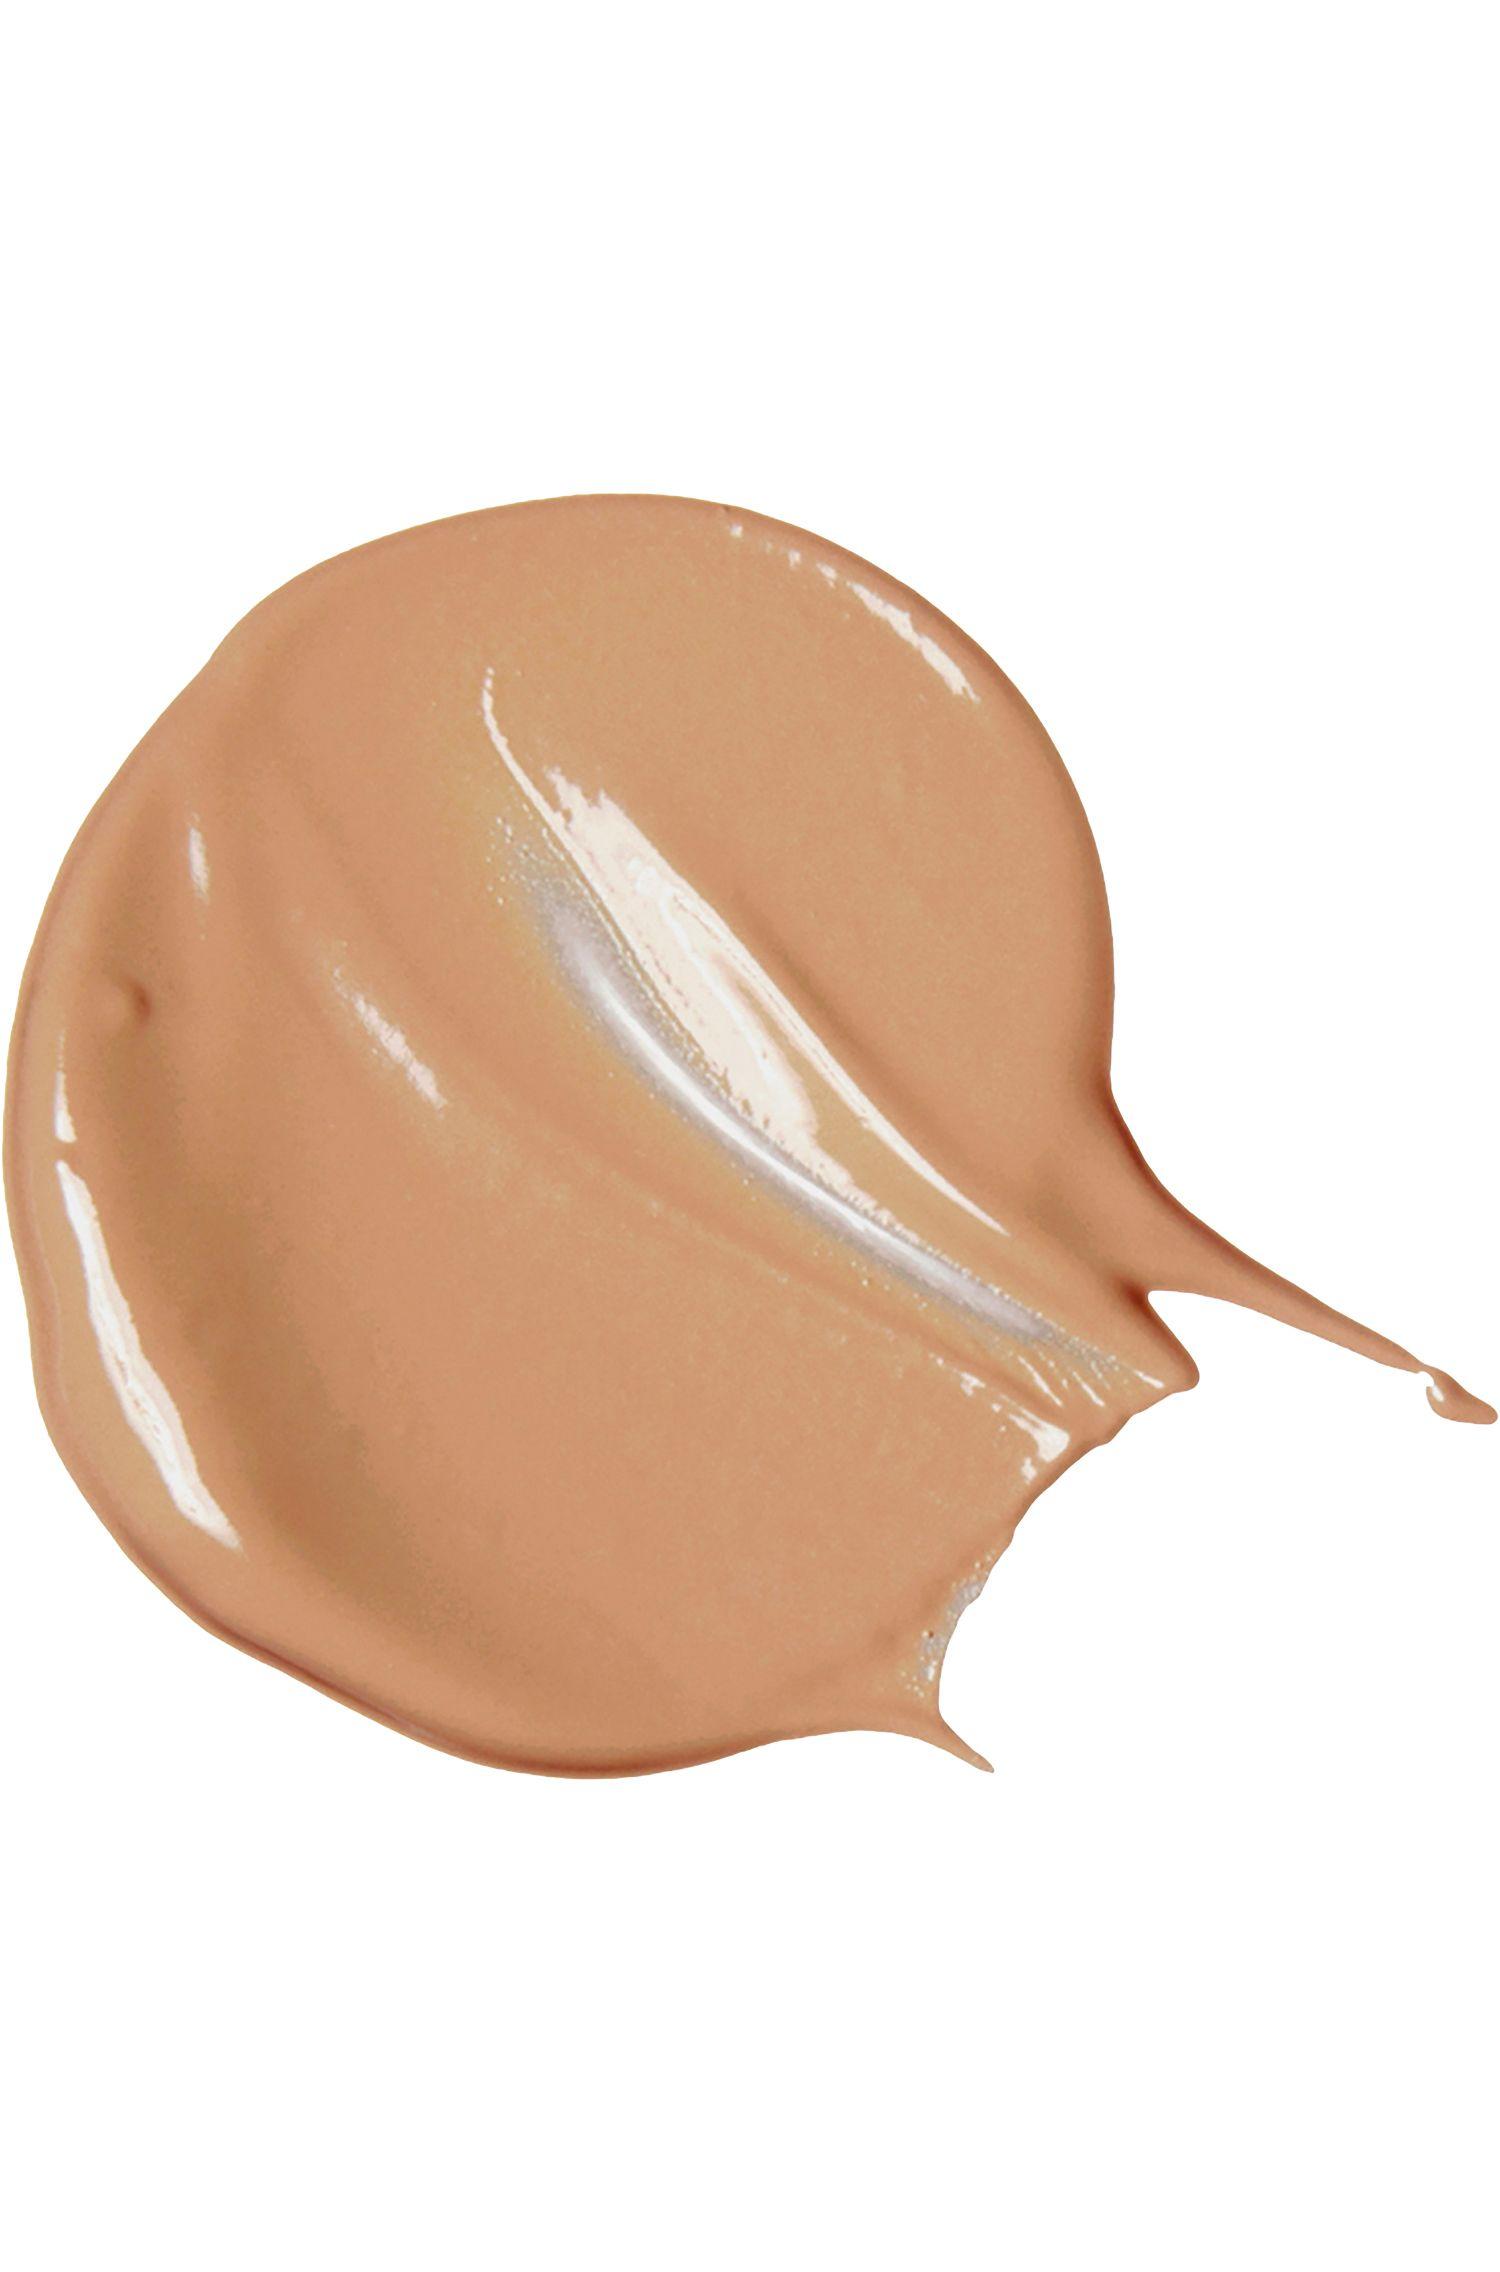 Blissim : Clarins - Fond de teint Teint Haute Tenue SPF15 - 110.5 Almond